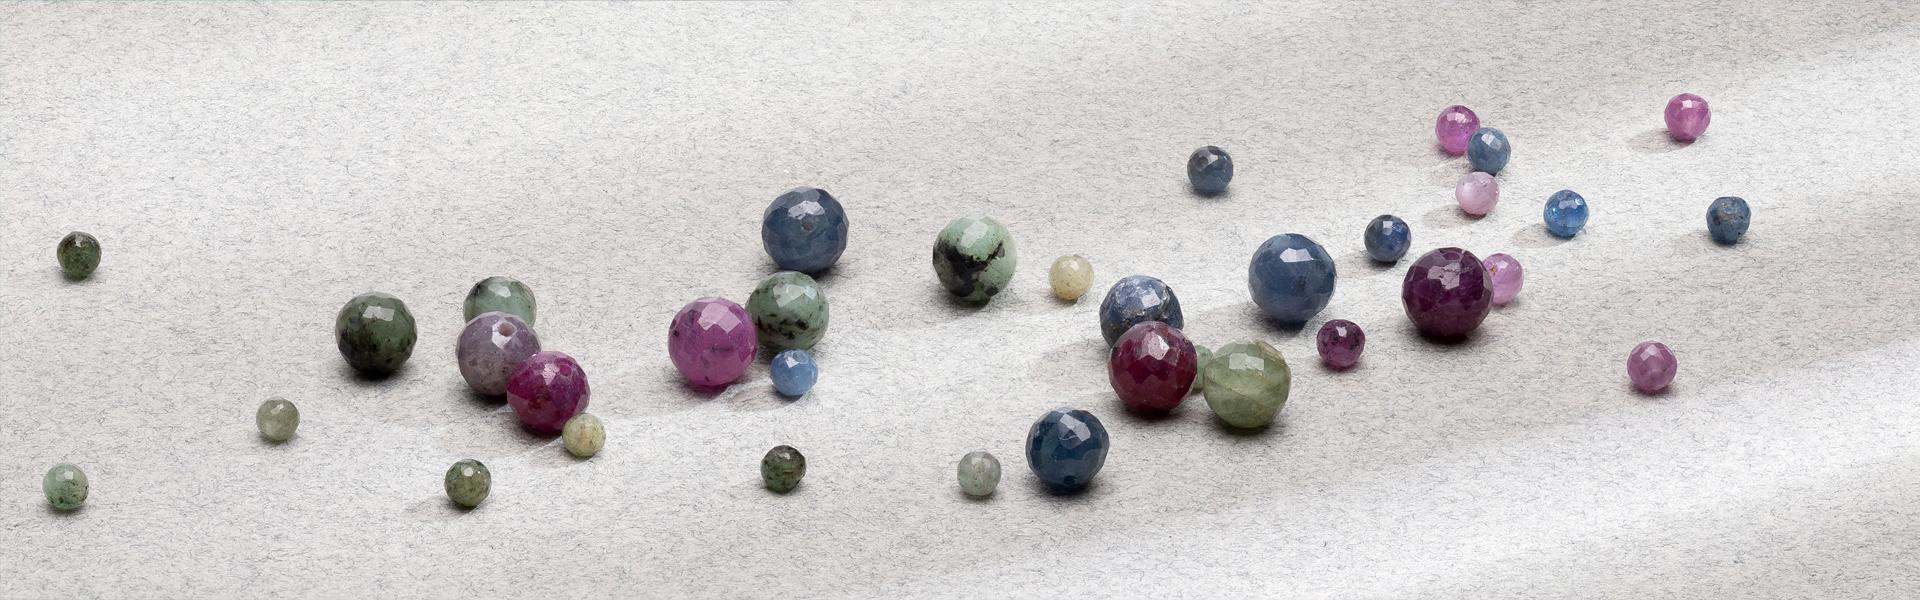 types of gemstones